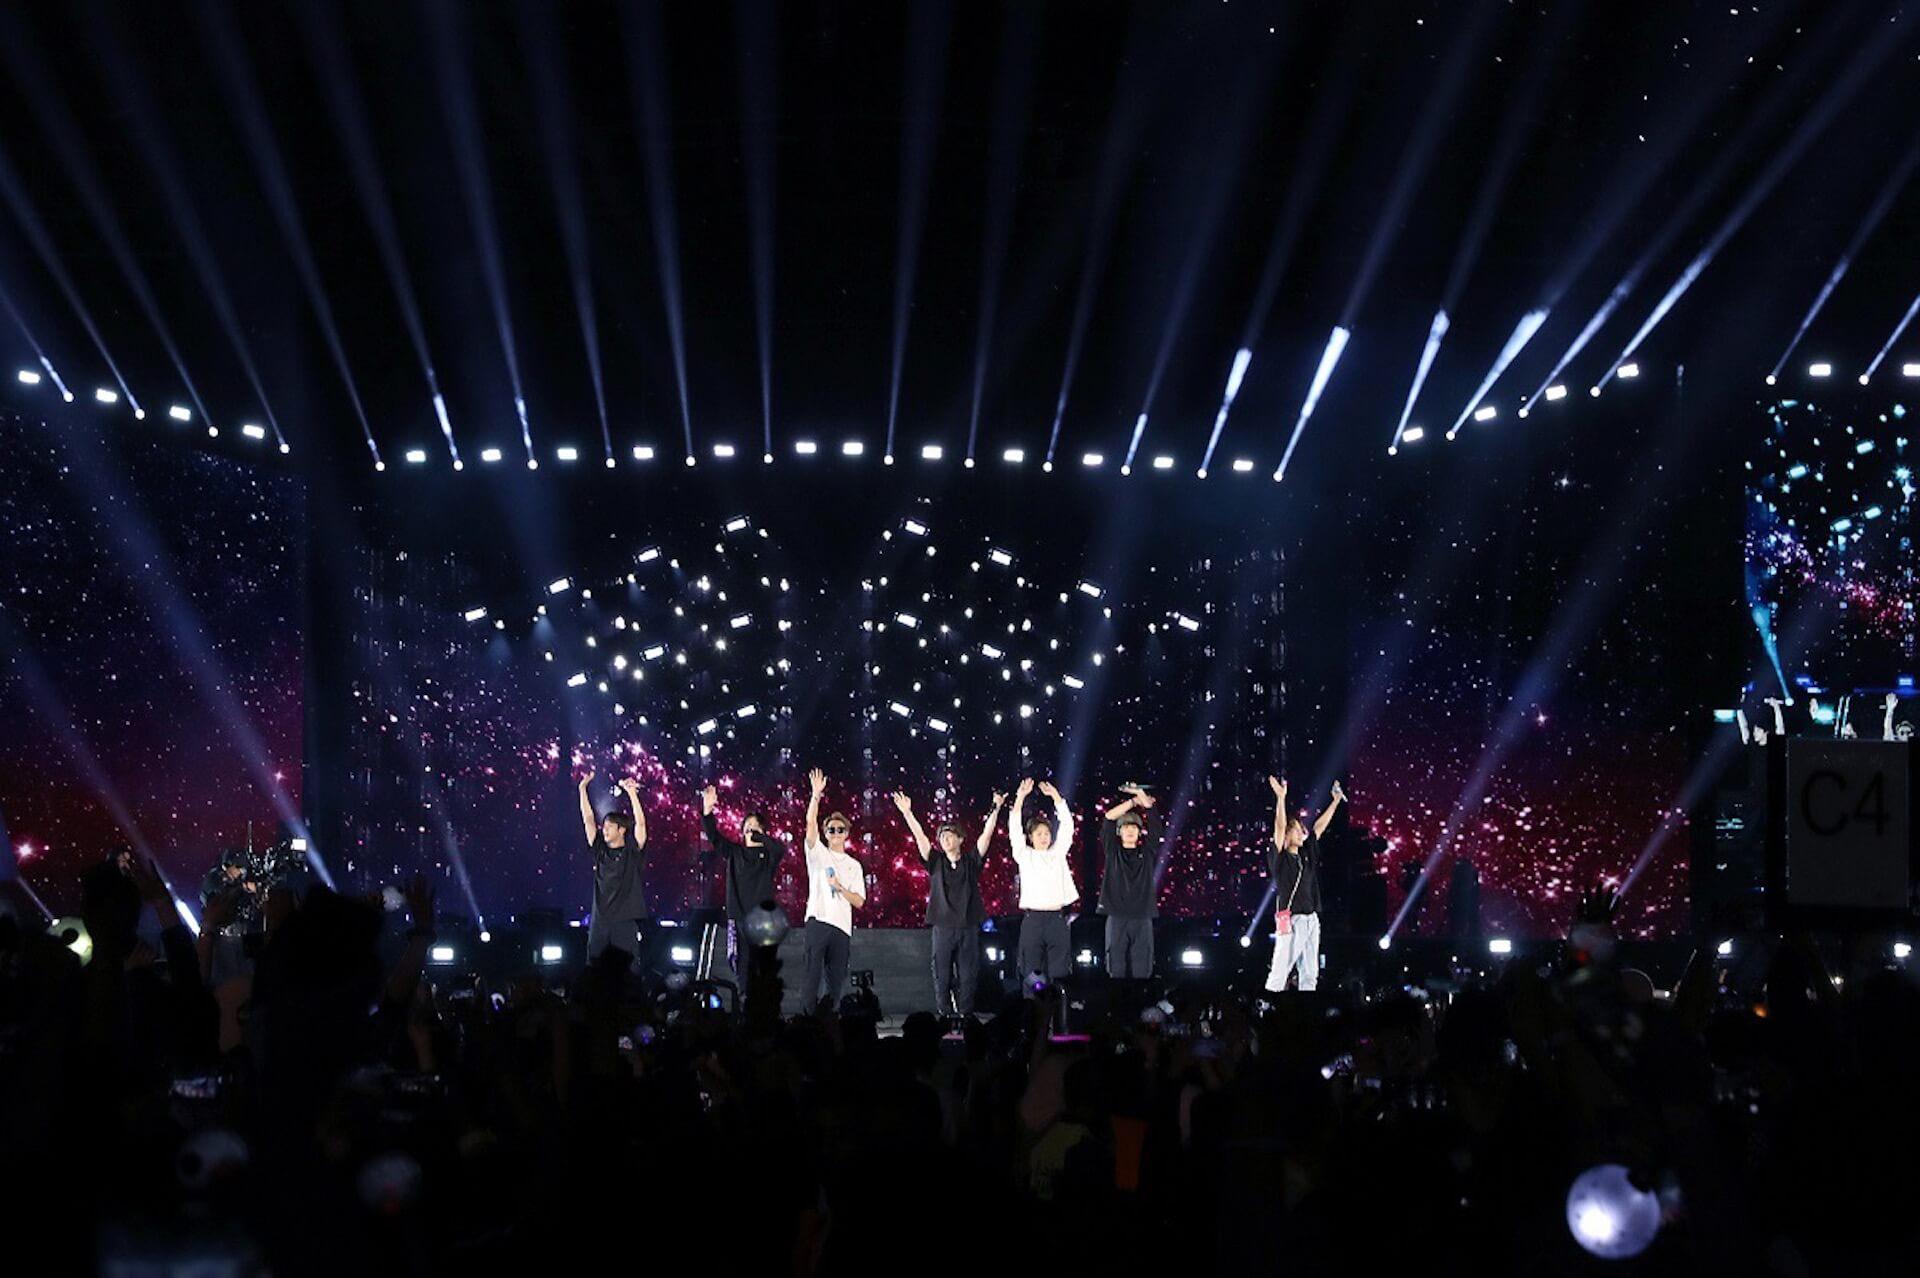 BTS、海外アーティスト初サウジアラビアのスタジアム単独コンサート開催!全世界のファンと一つになった歴史的瞬間 music191011-bts-1